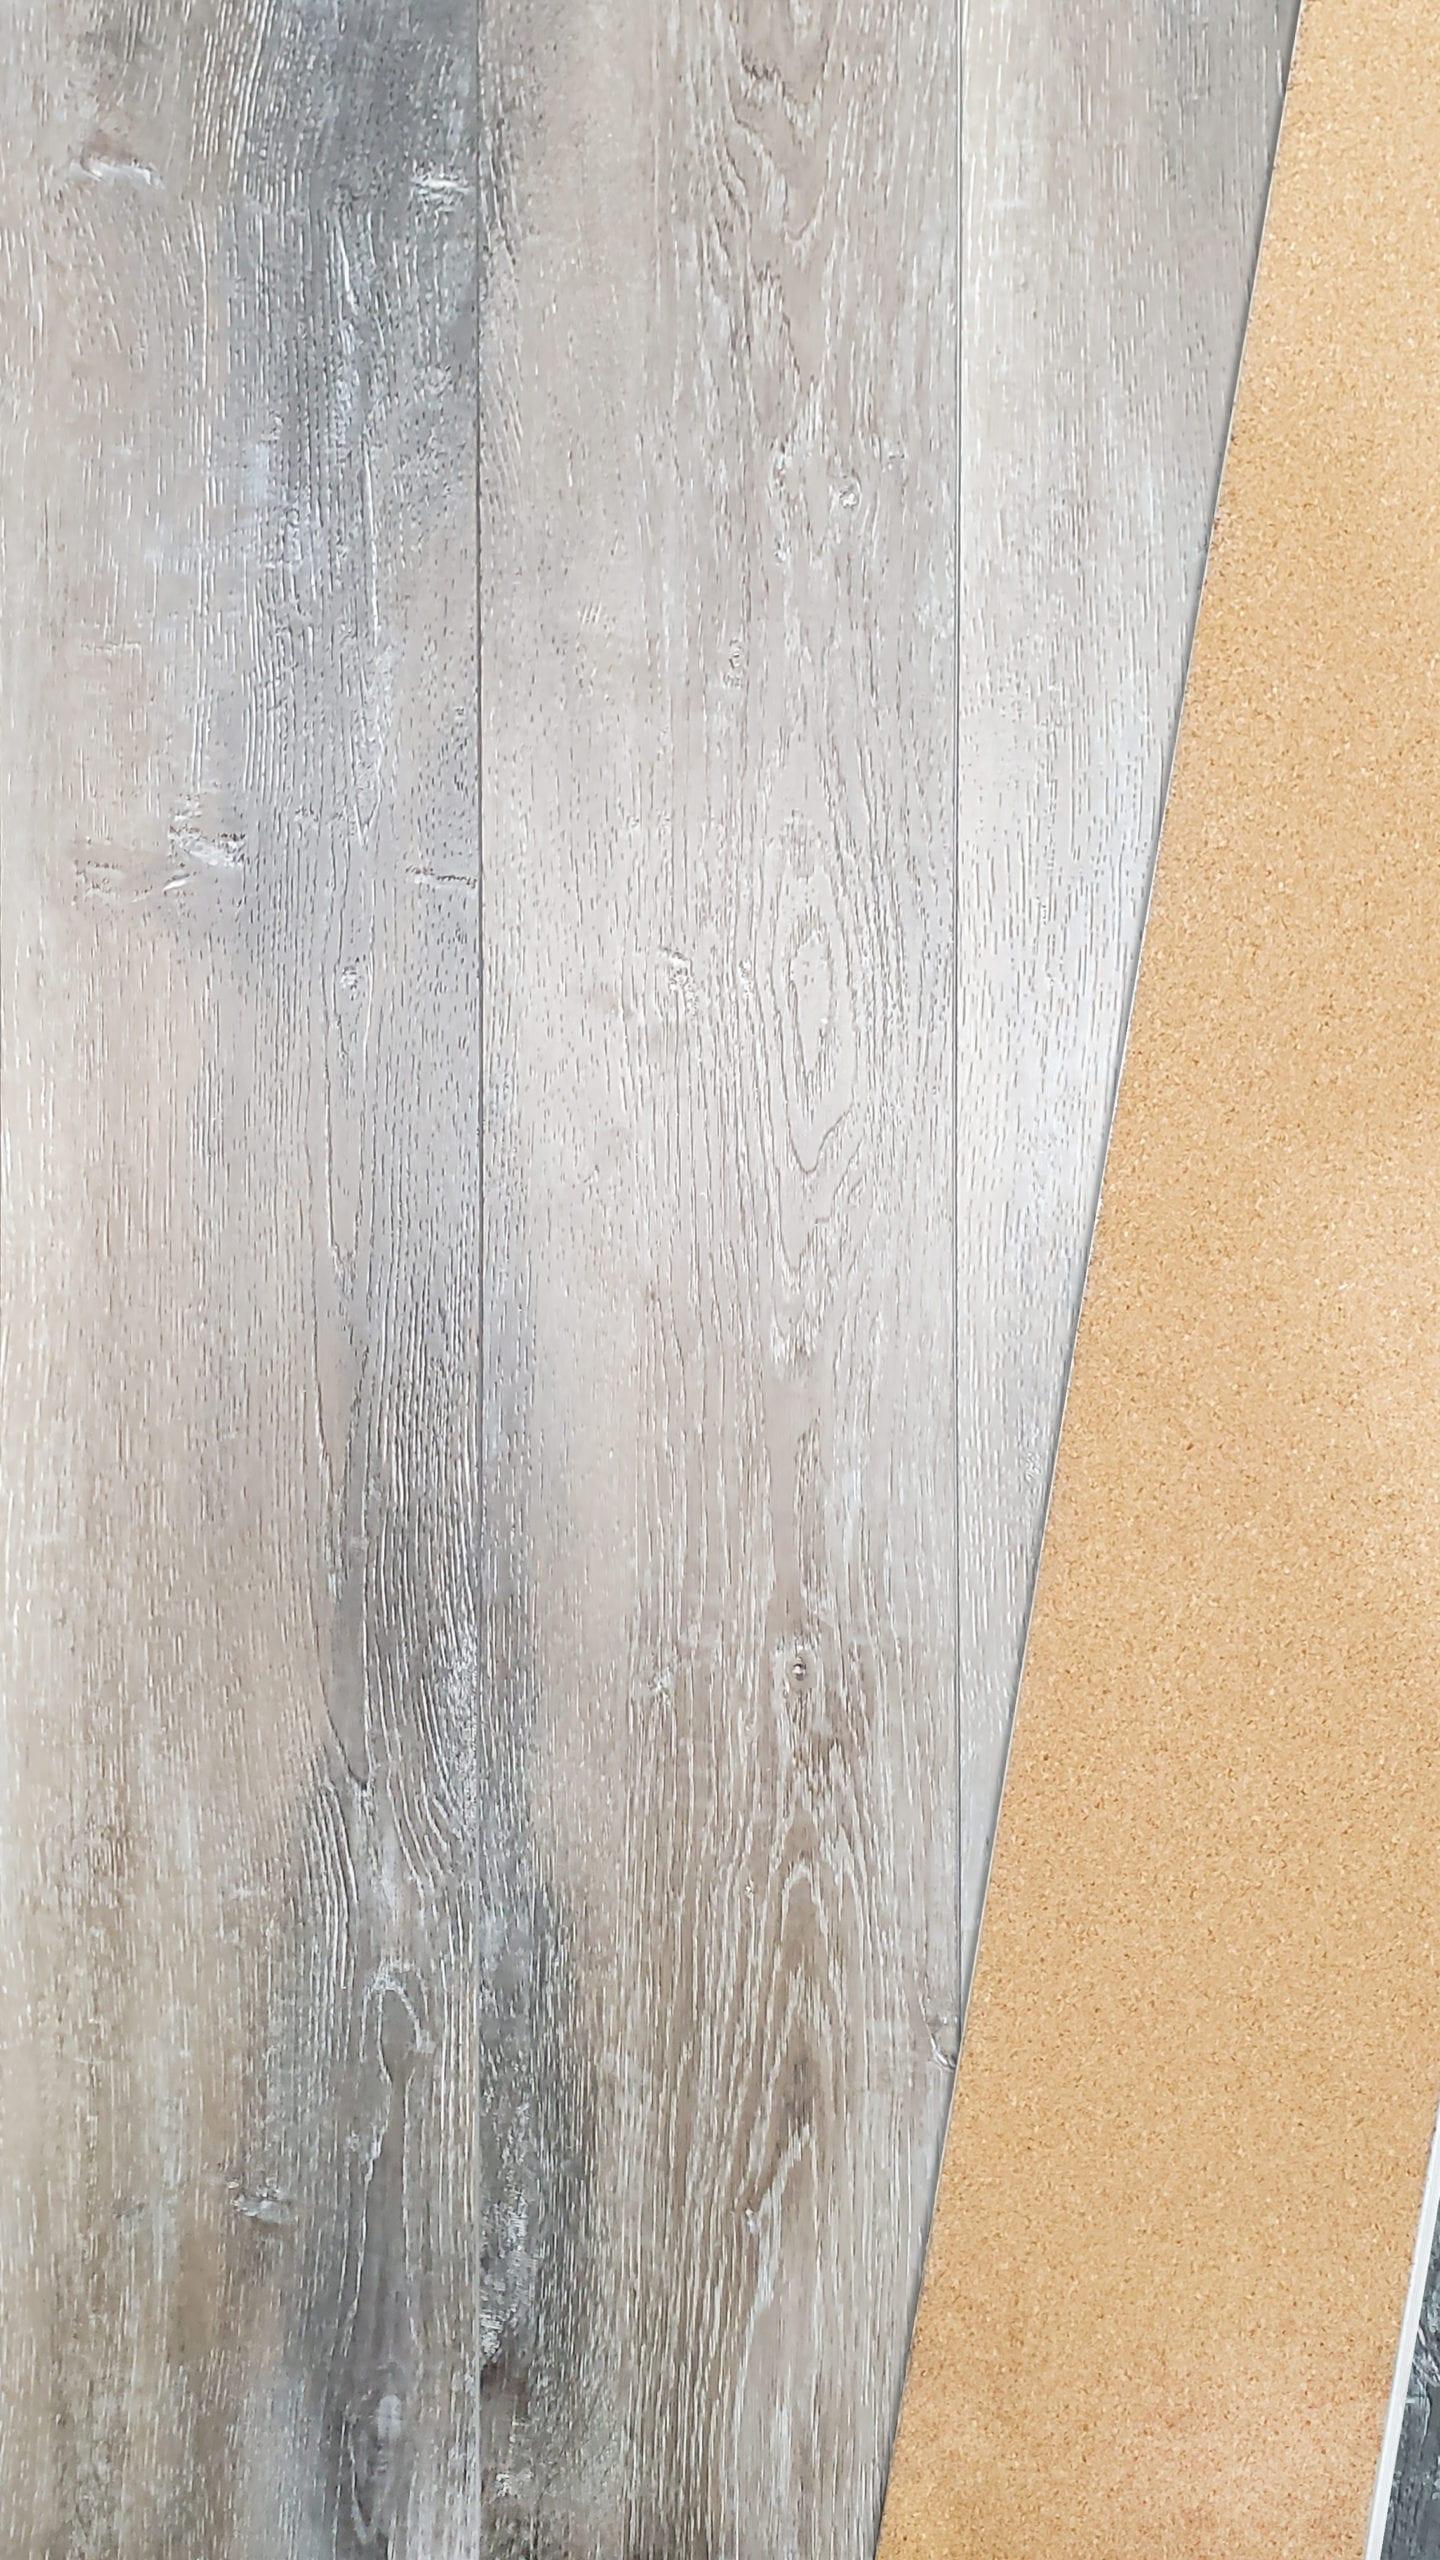 8mm SPC Embossed Vinyl w20mil wear_Painted Bevel_Cork Back_Taylor Ash_16.36sfct_6.58_3.69